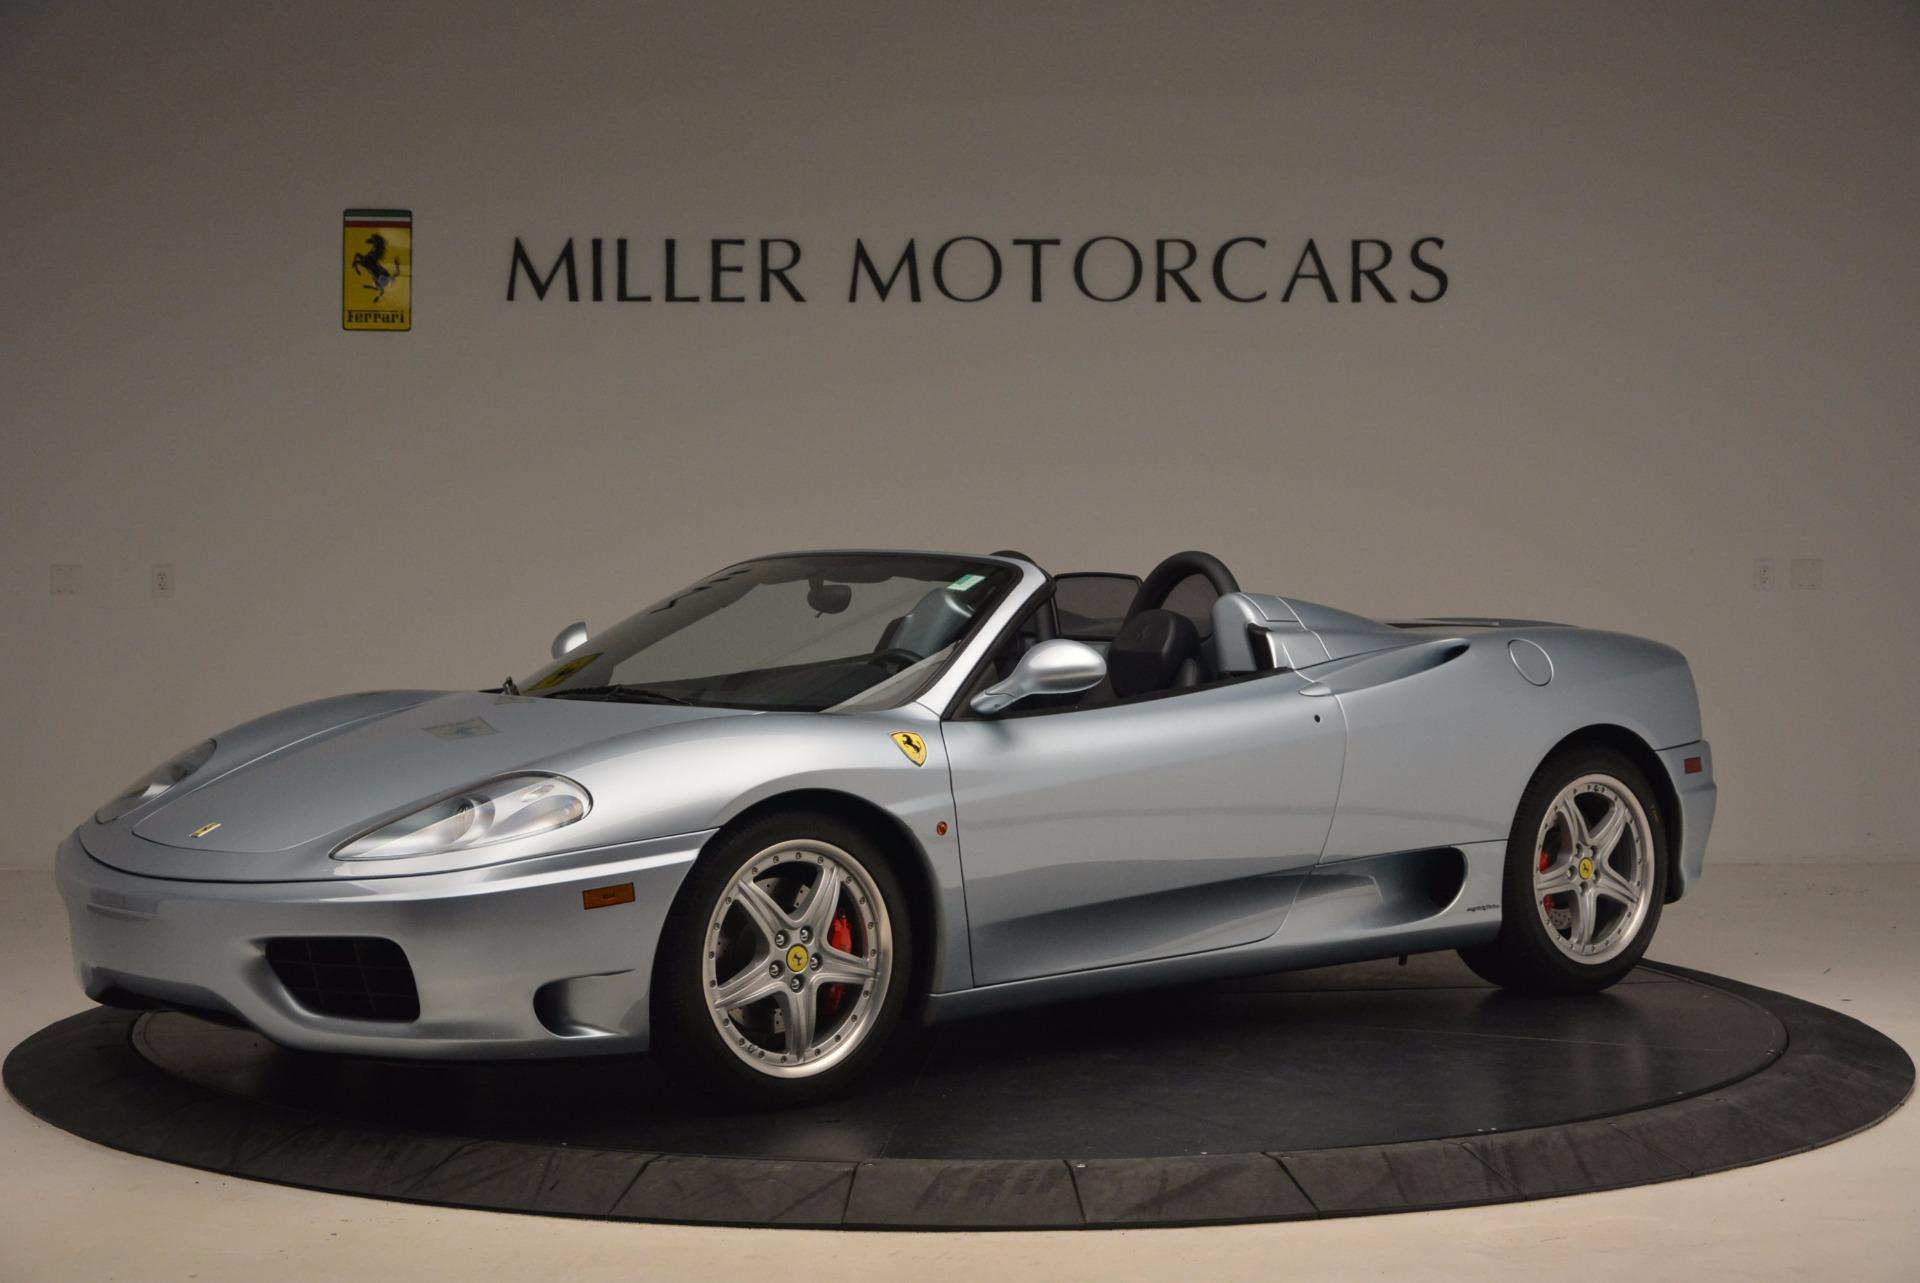 Used 2003 Ferrari 360 Spider 6-Speed Manual For Sale In Westport, CT 1445_p2